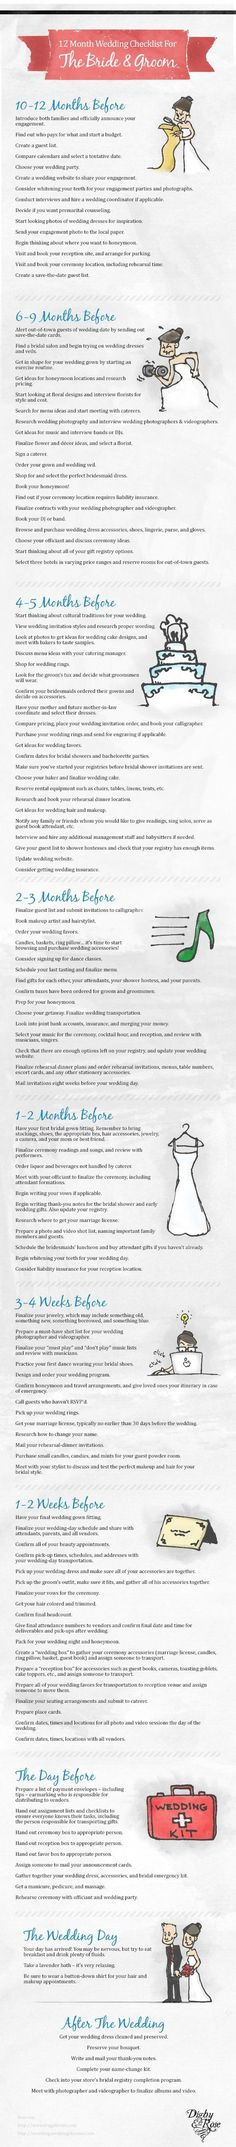 wedding list to do, futur, wedding to do lists, dream, wedding timeline checklist